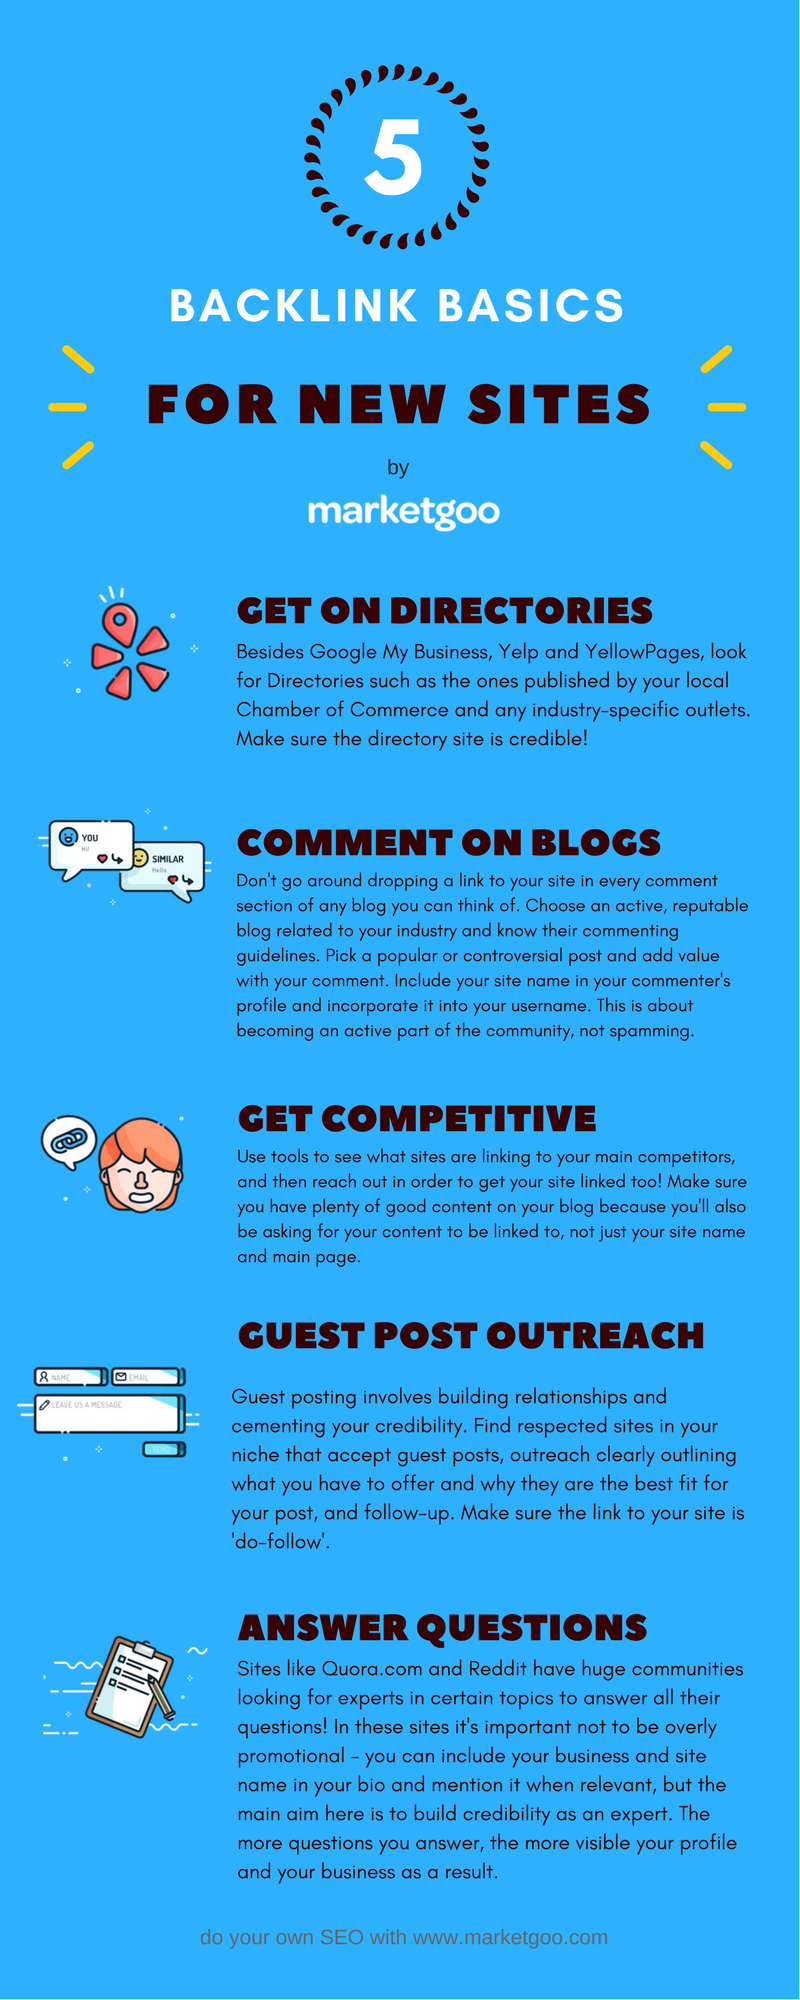 SEO Cheatsheet: Link-Building Tips for Beginners - marketgoo